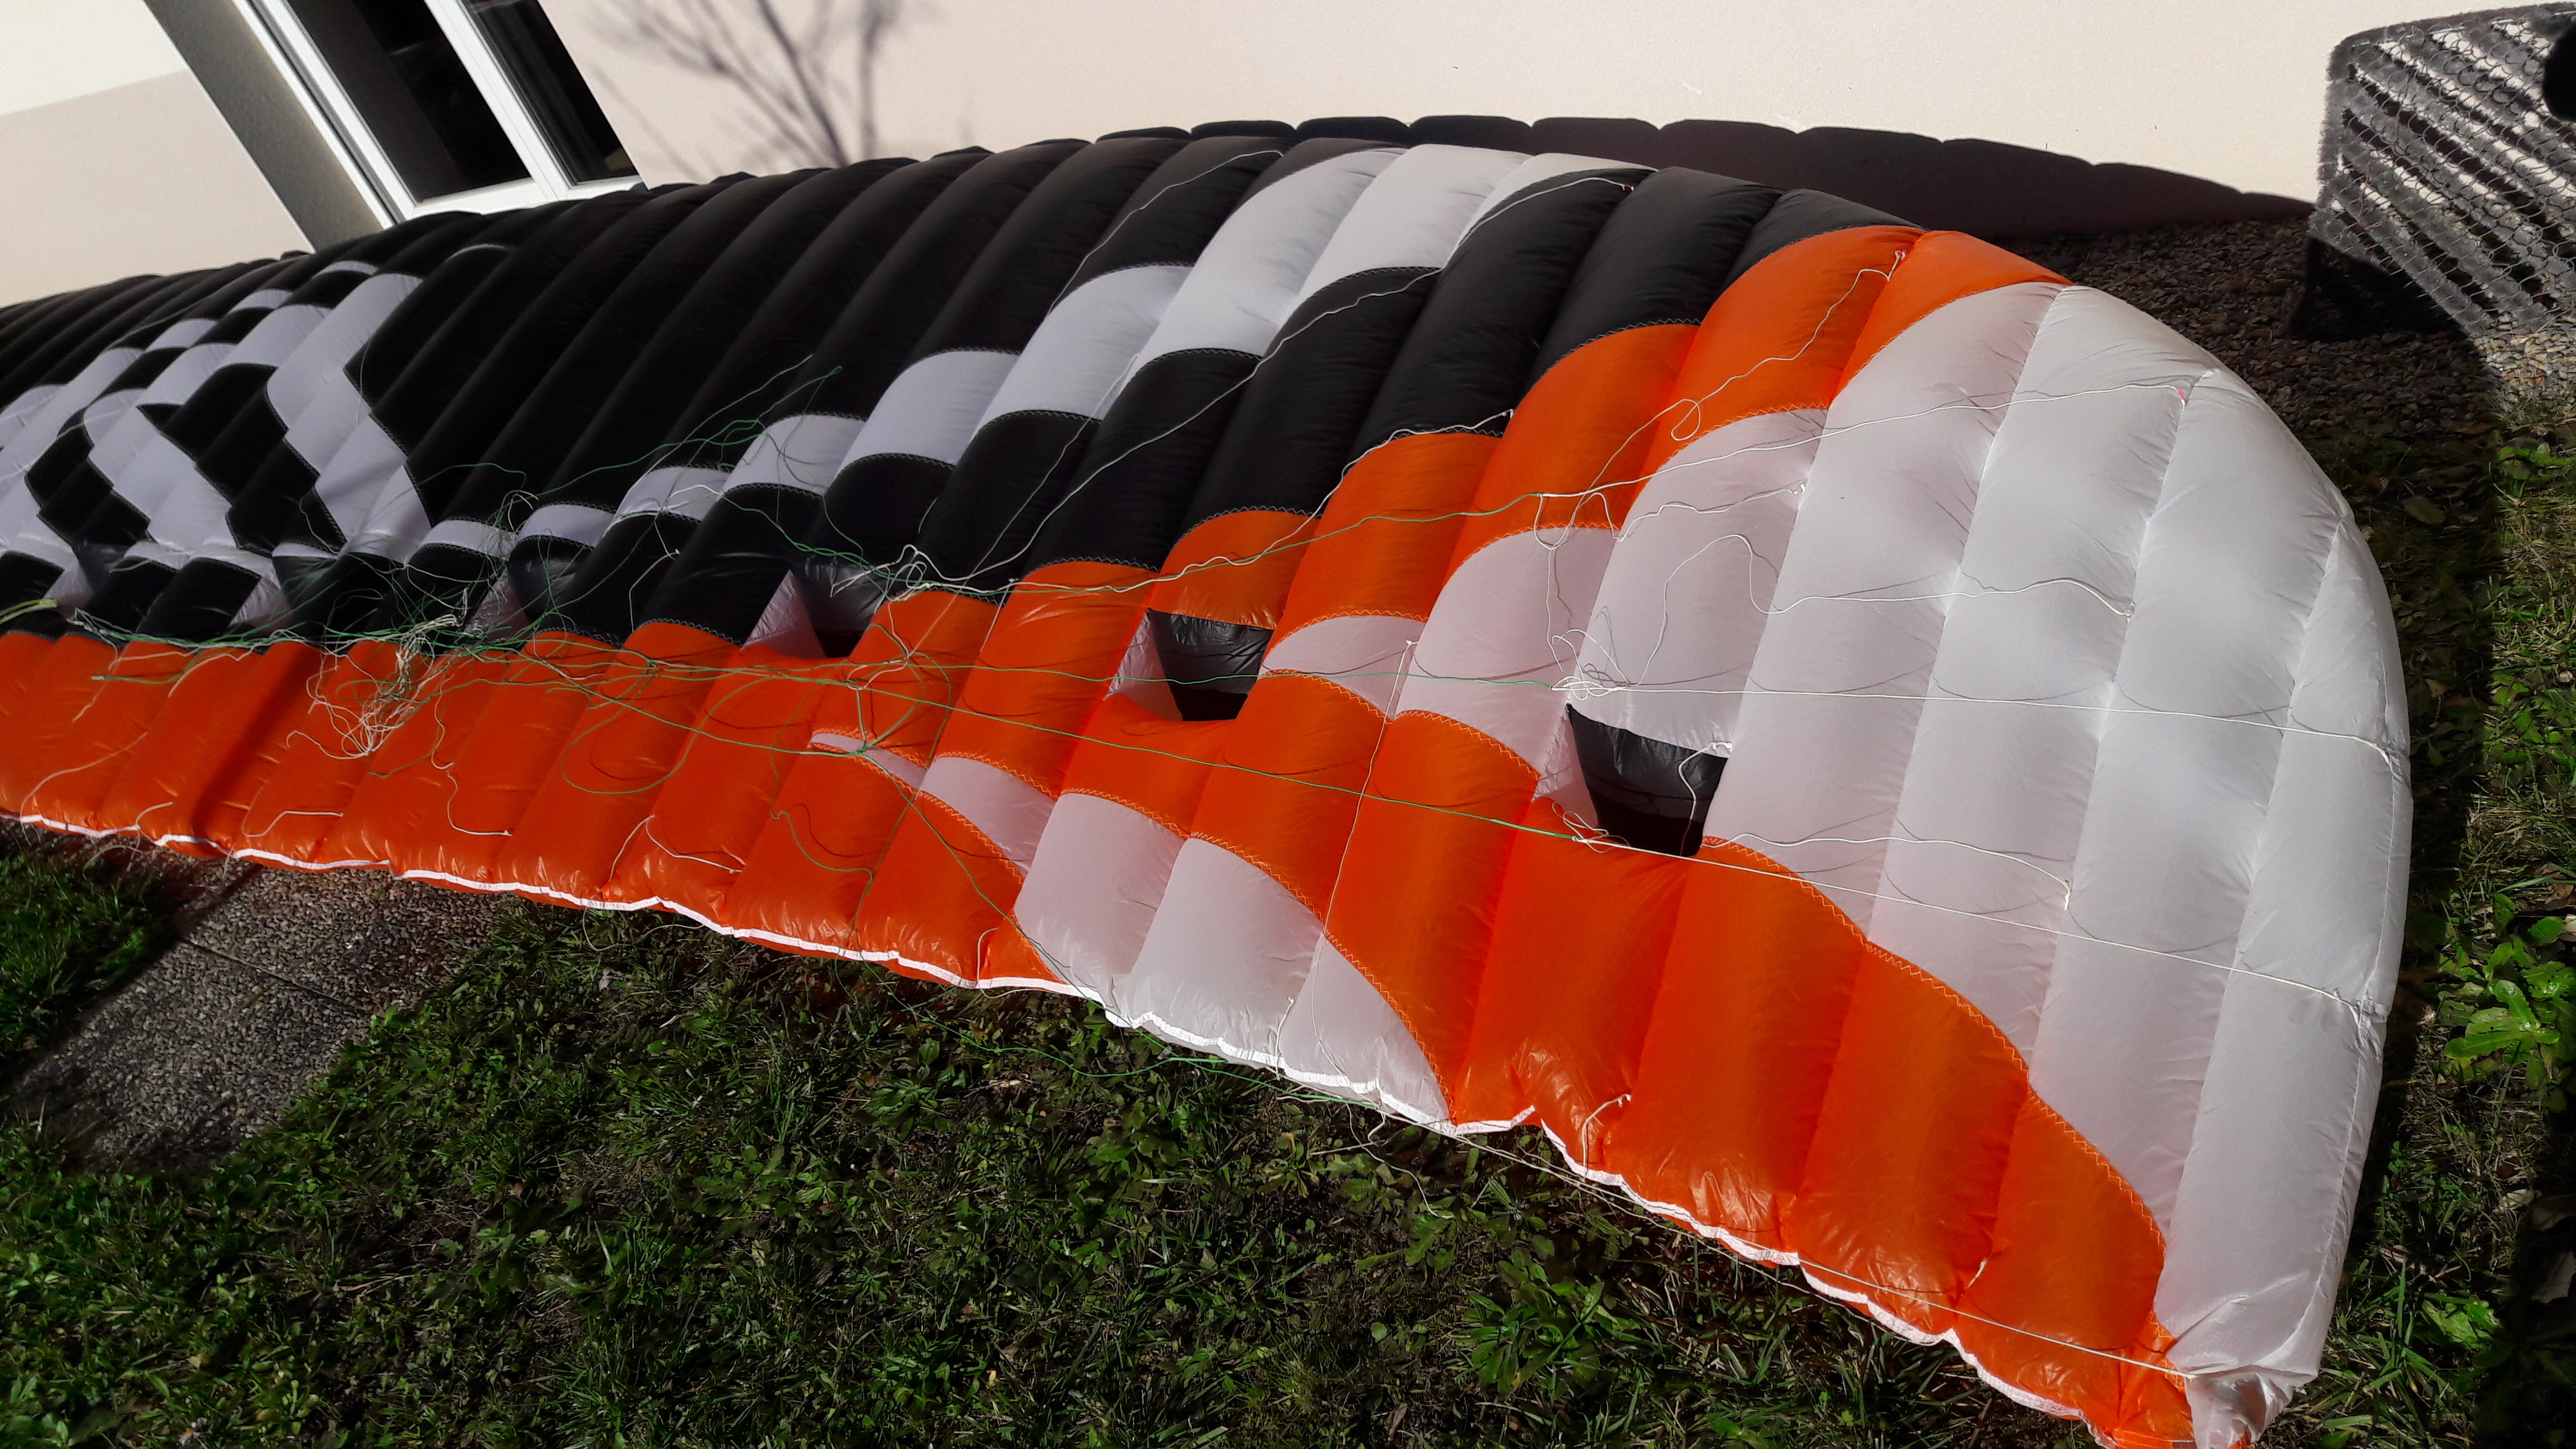 [VENDUE] Flysurfer speed4 lotus LIMITED EDITION 15m² - 1100e 37317420171125120724